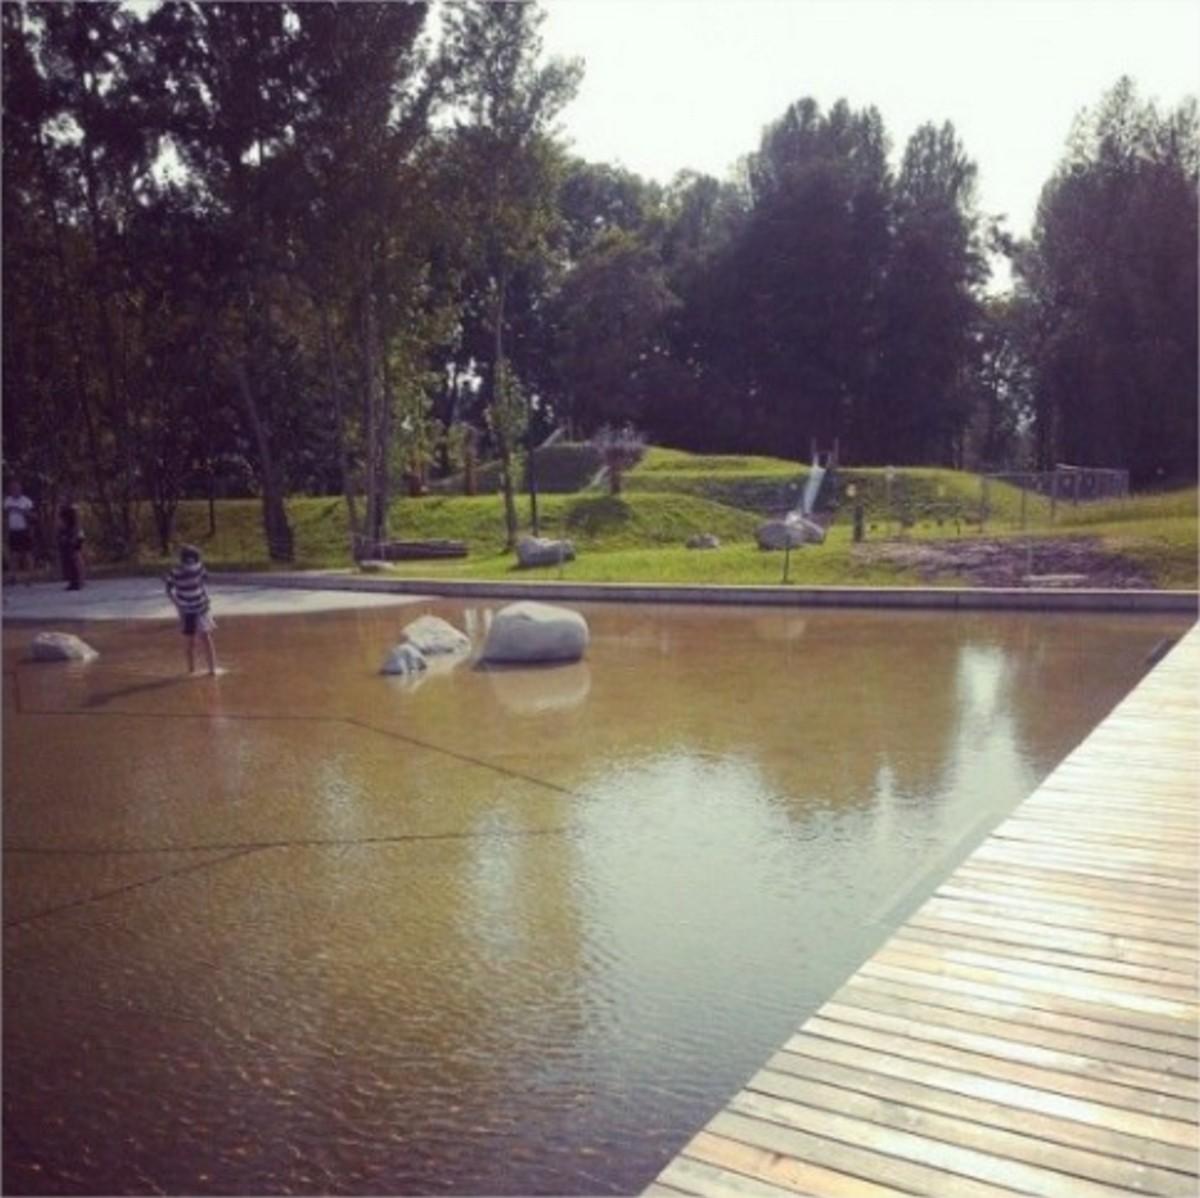 The Heyritz Park